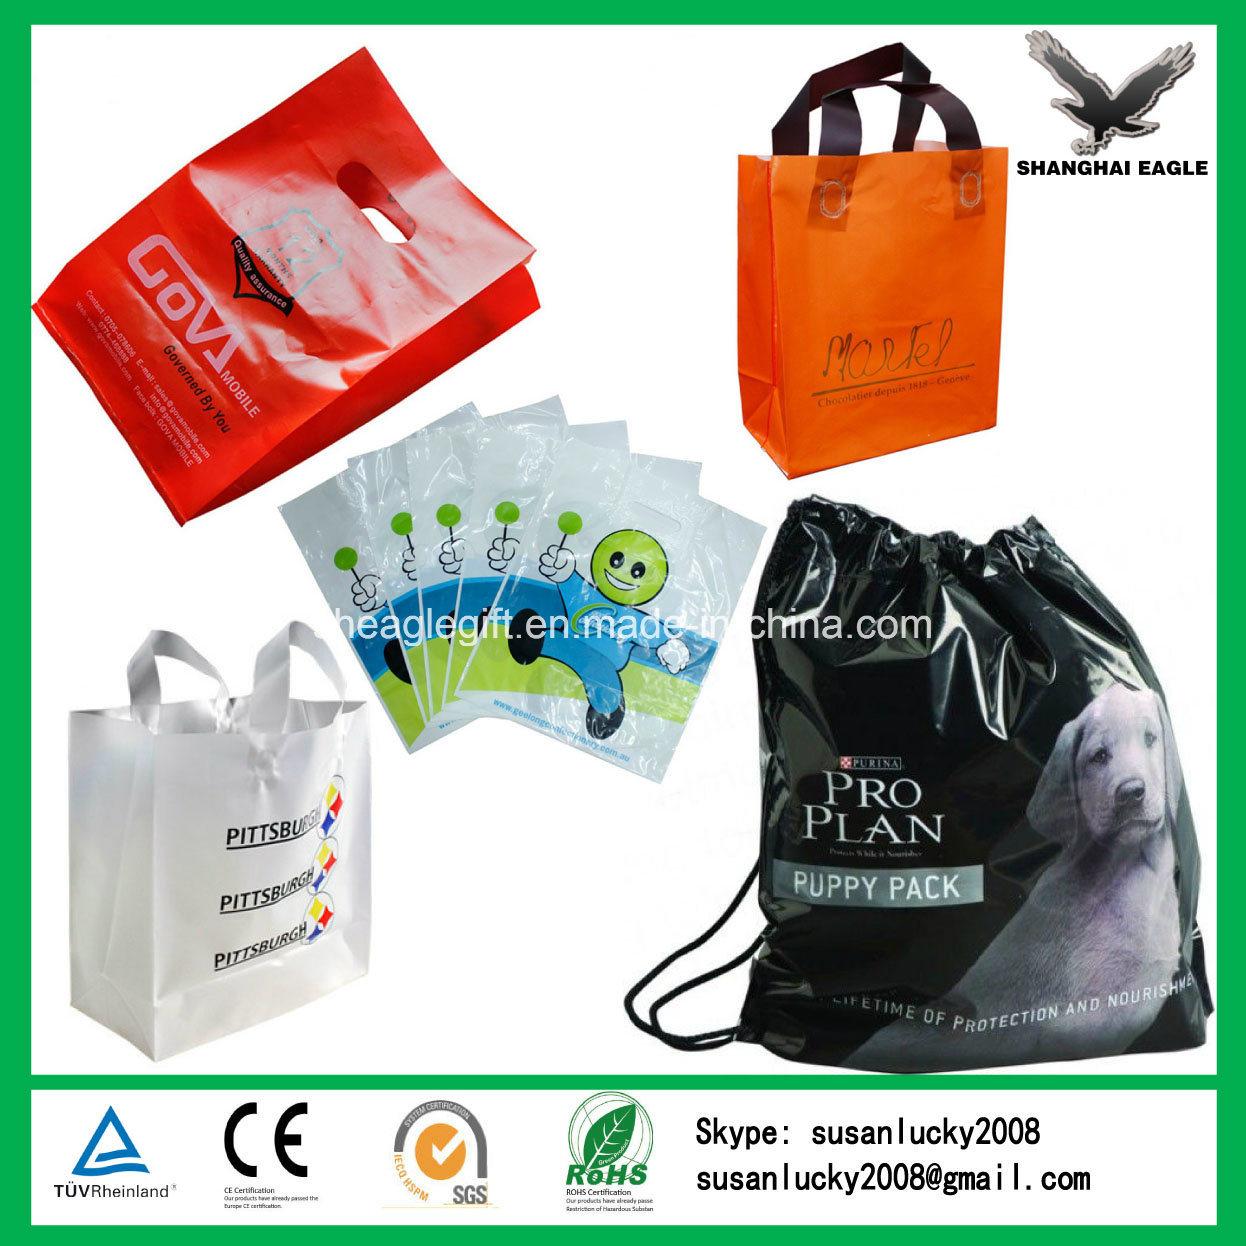 Custom HDPE/LDPE Printed Plastic Bags